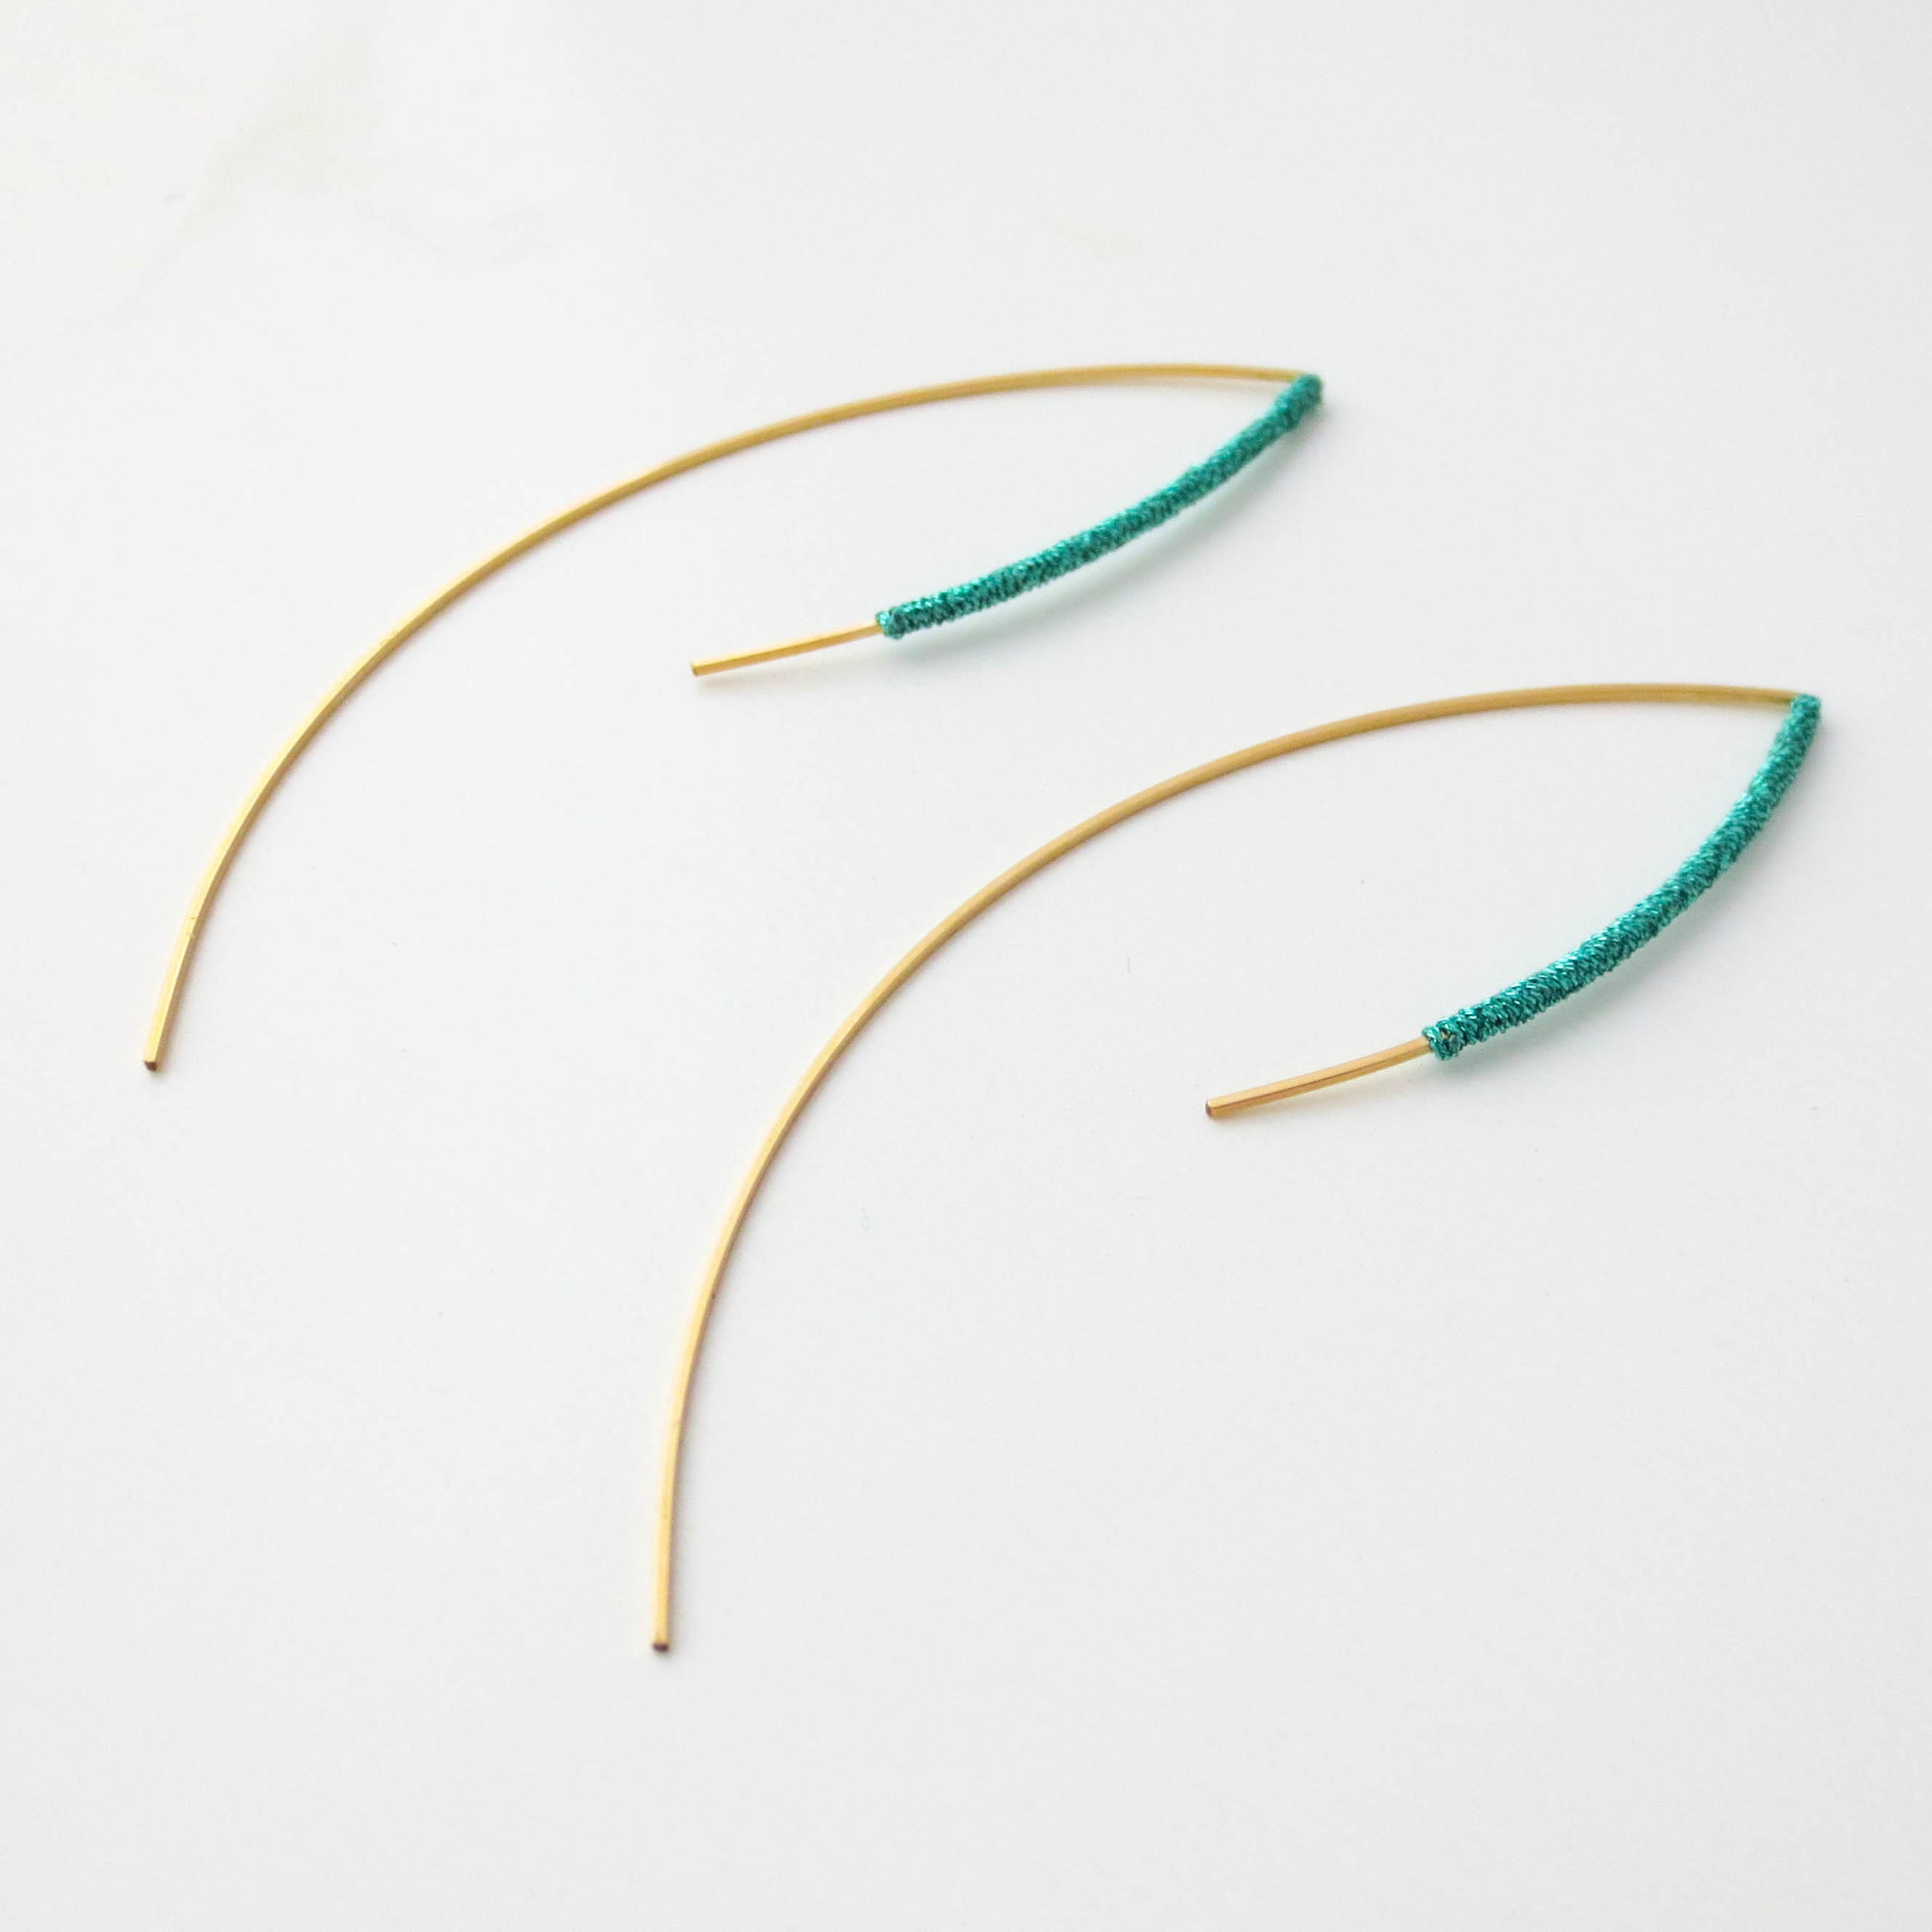 wire-arc-wrapped-3.jpg